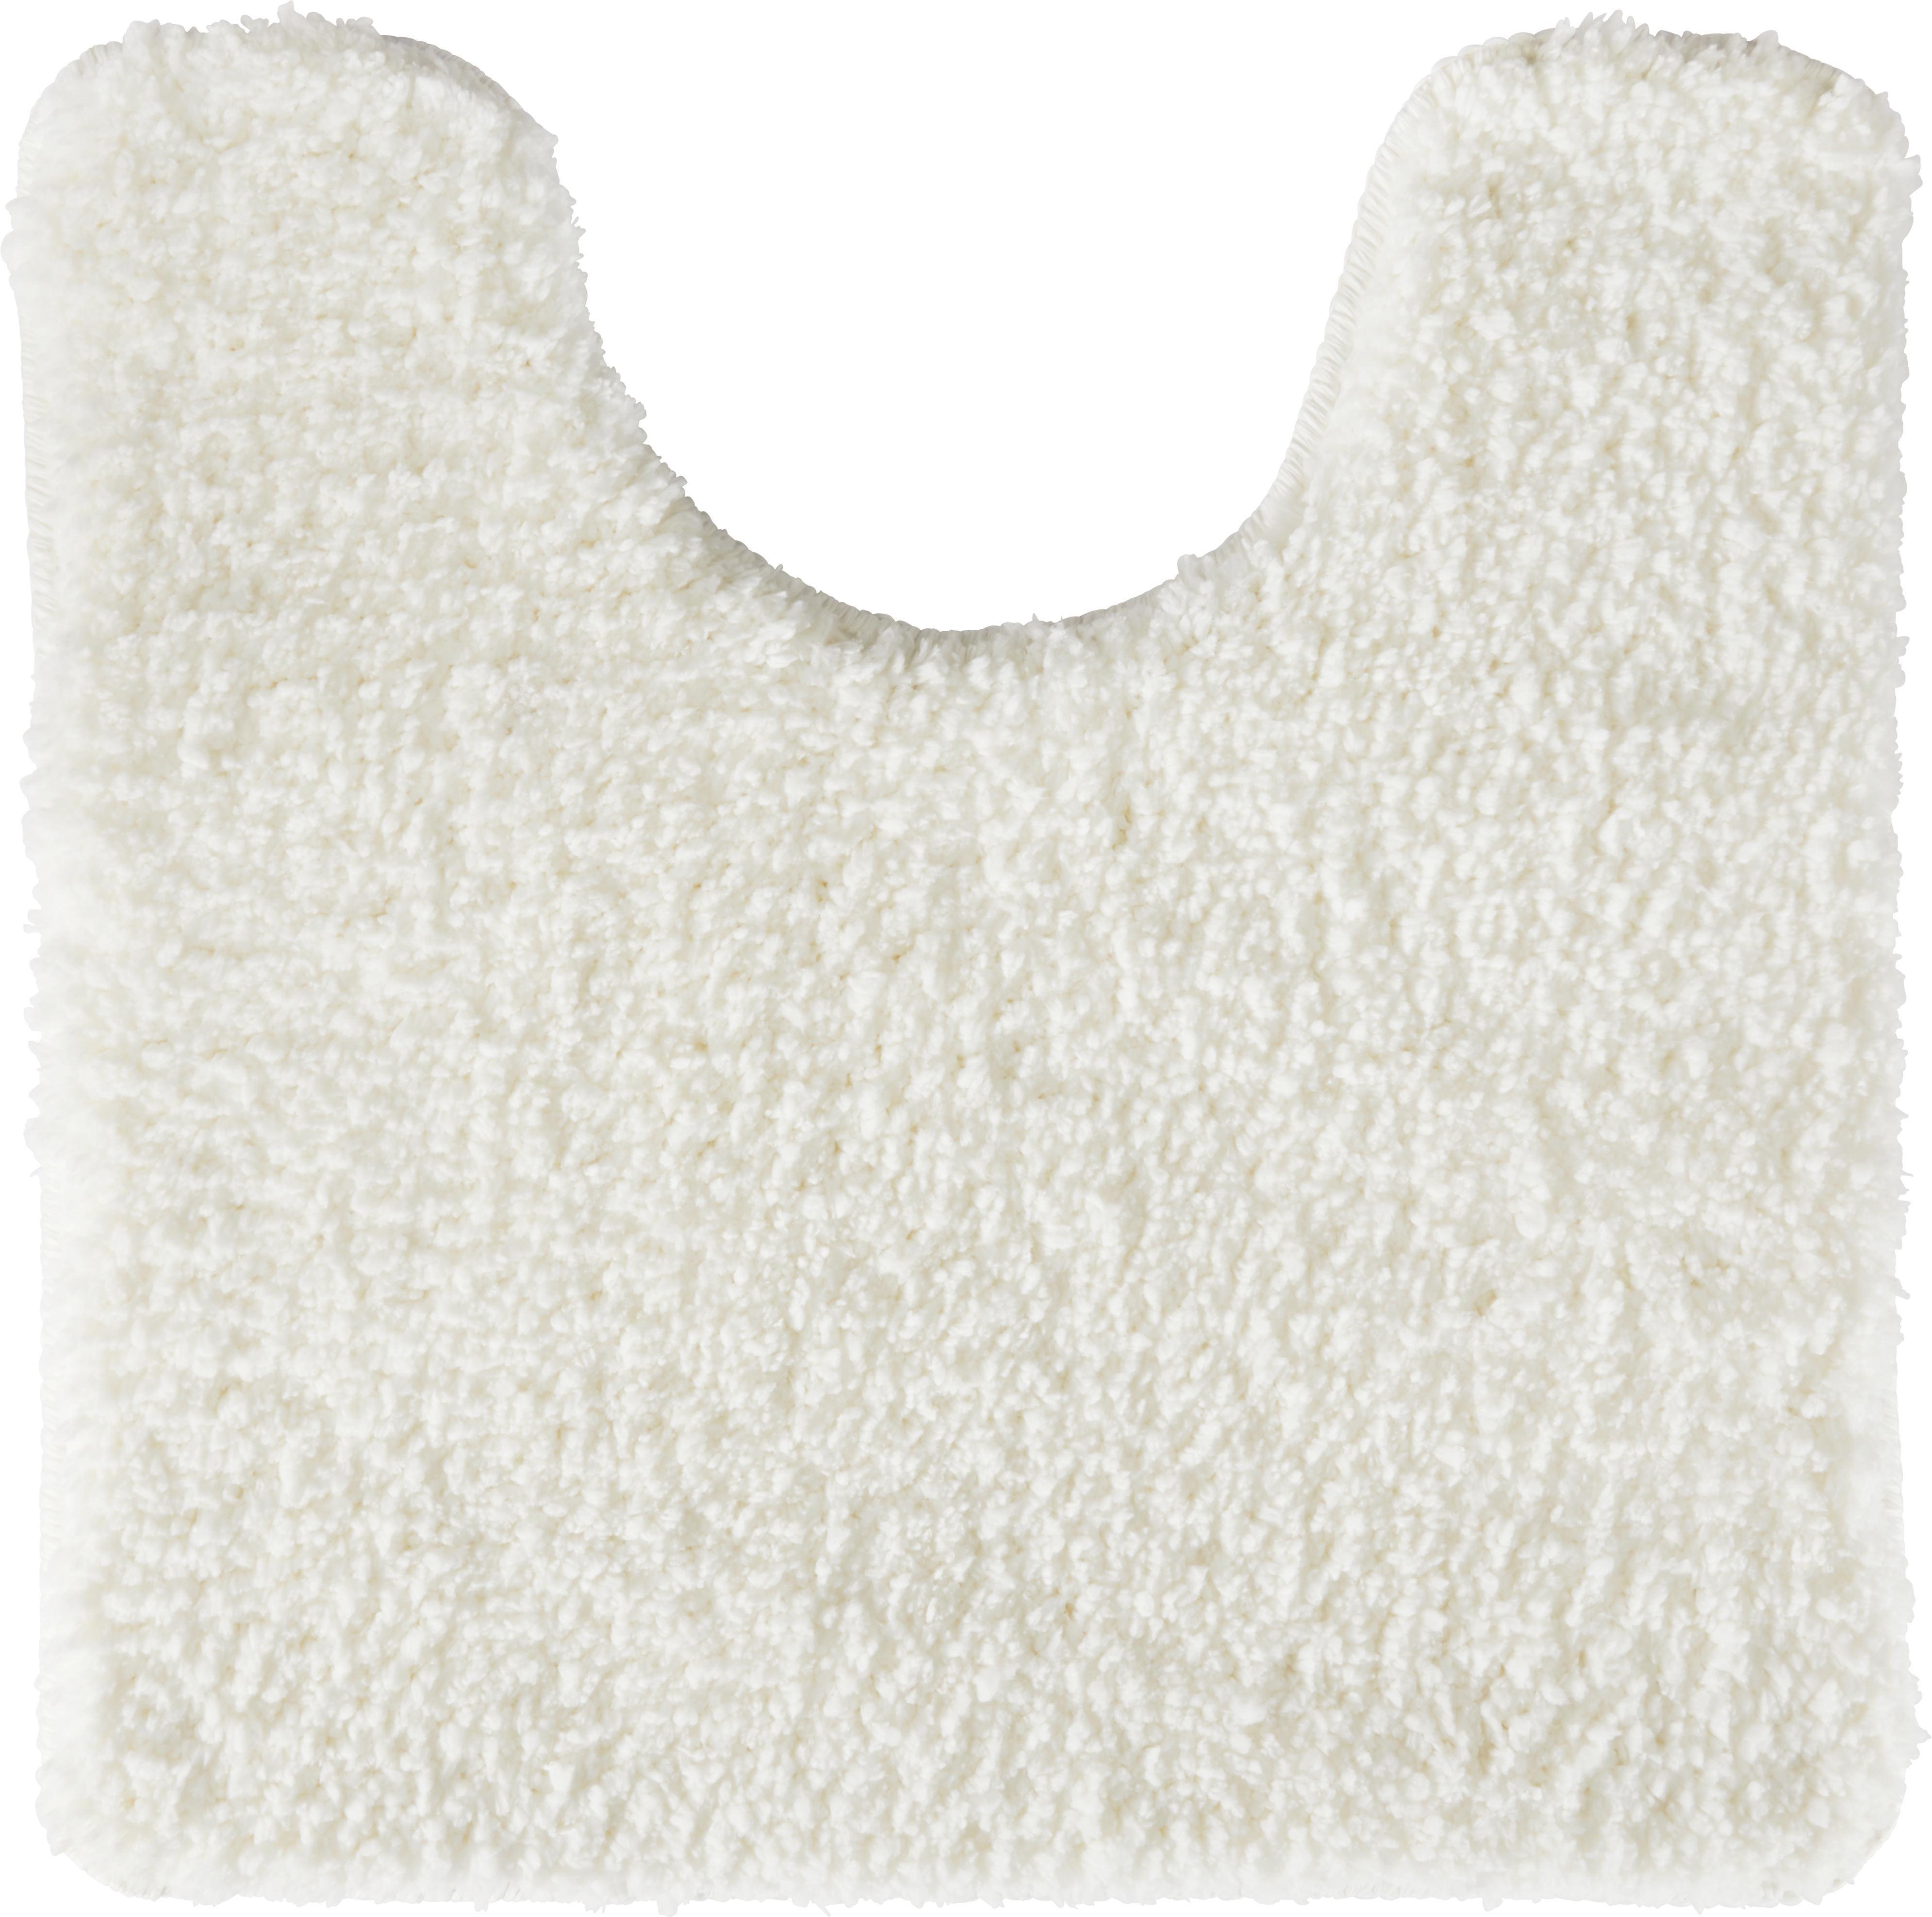 WC Vorleger Christina Ca. 50x50cm   Weiß, Textil (50/50cm)